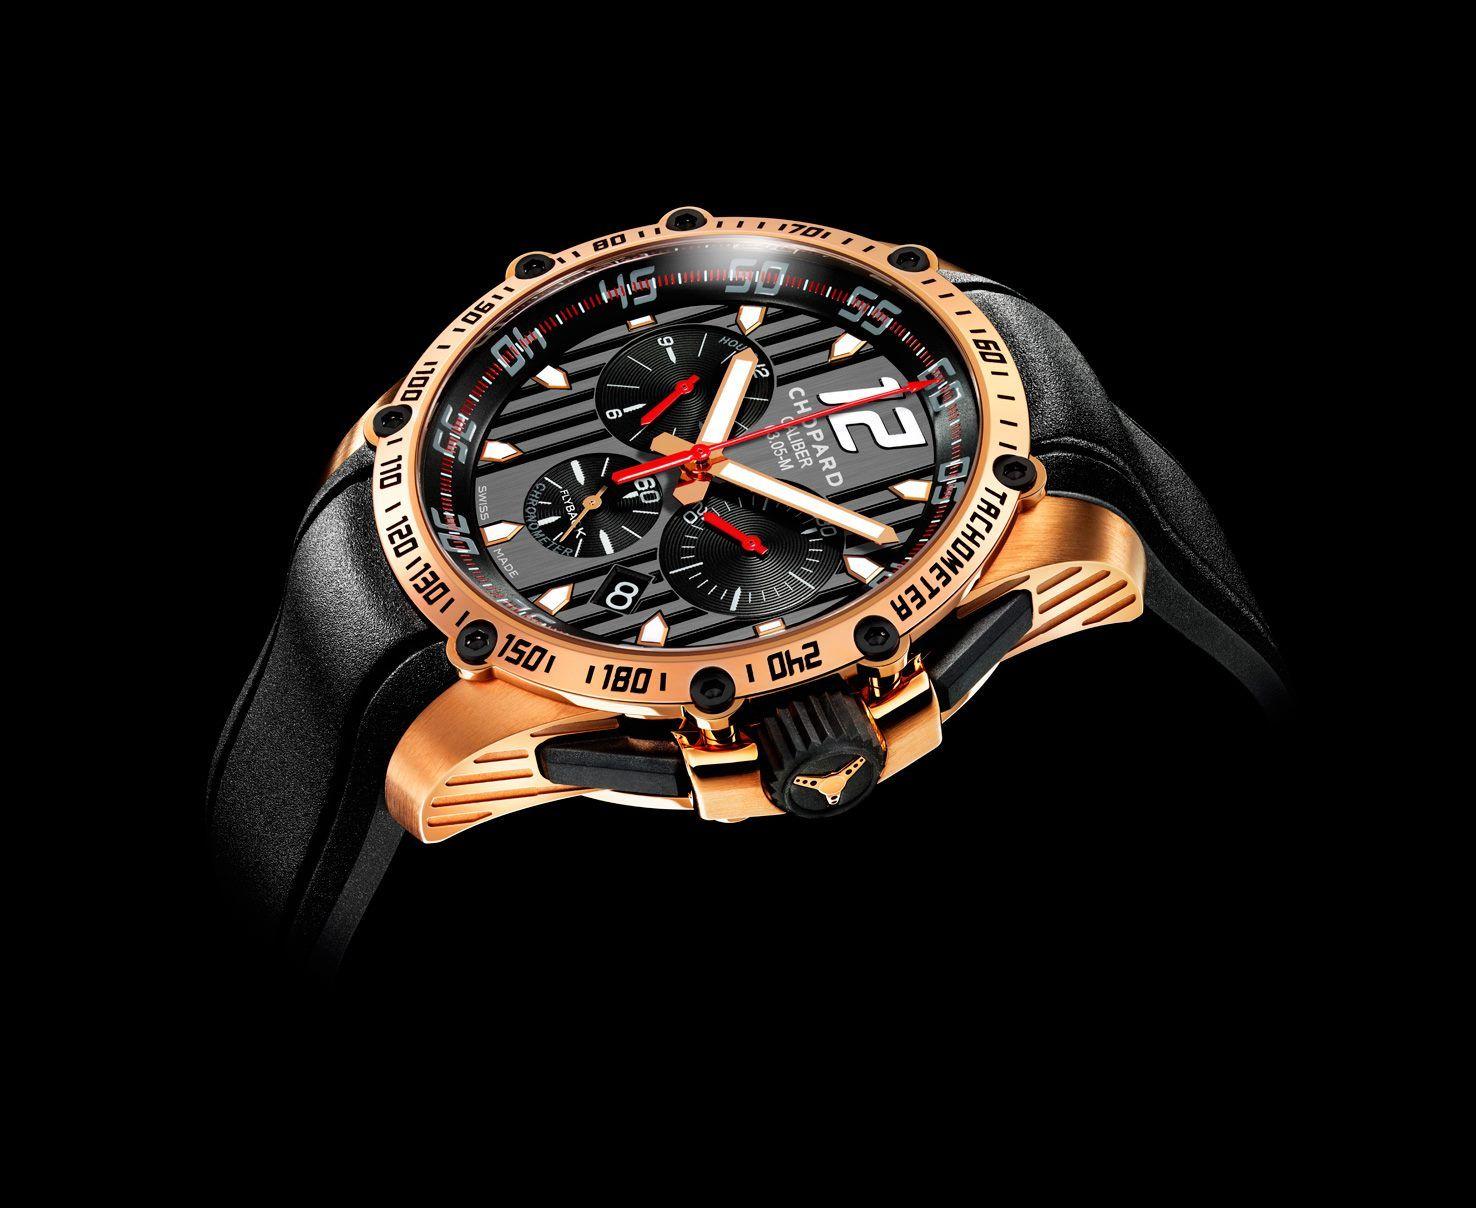 Chopard Chopard Watch Chopard Monochrome Watches